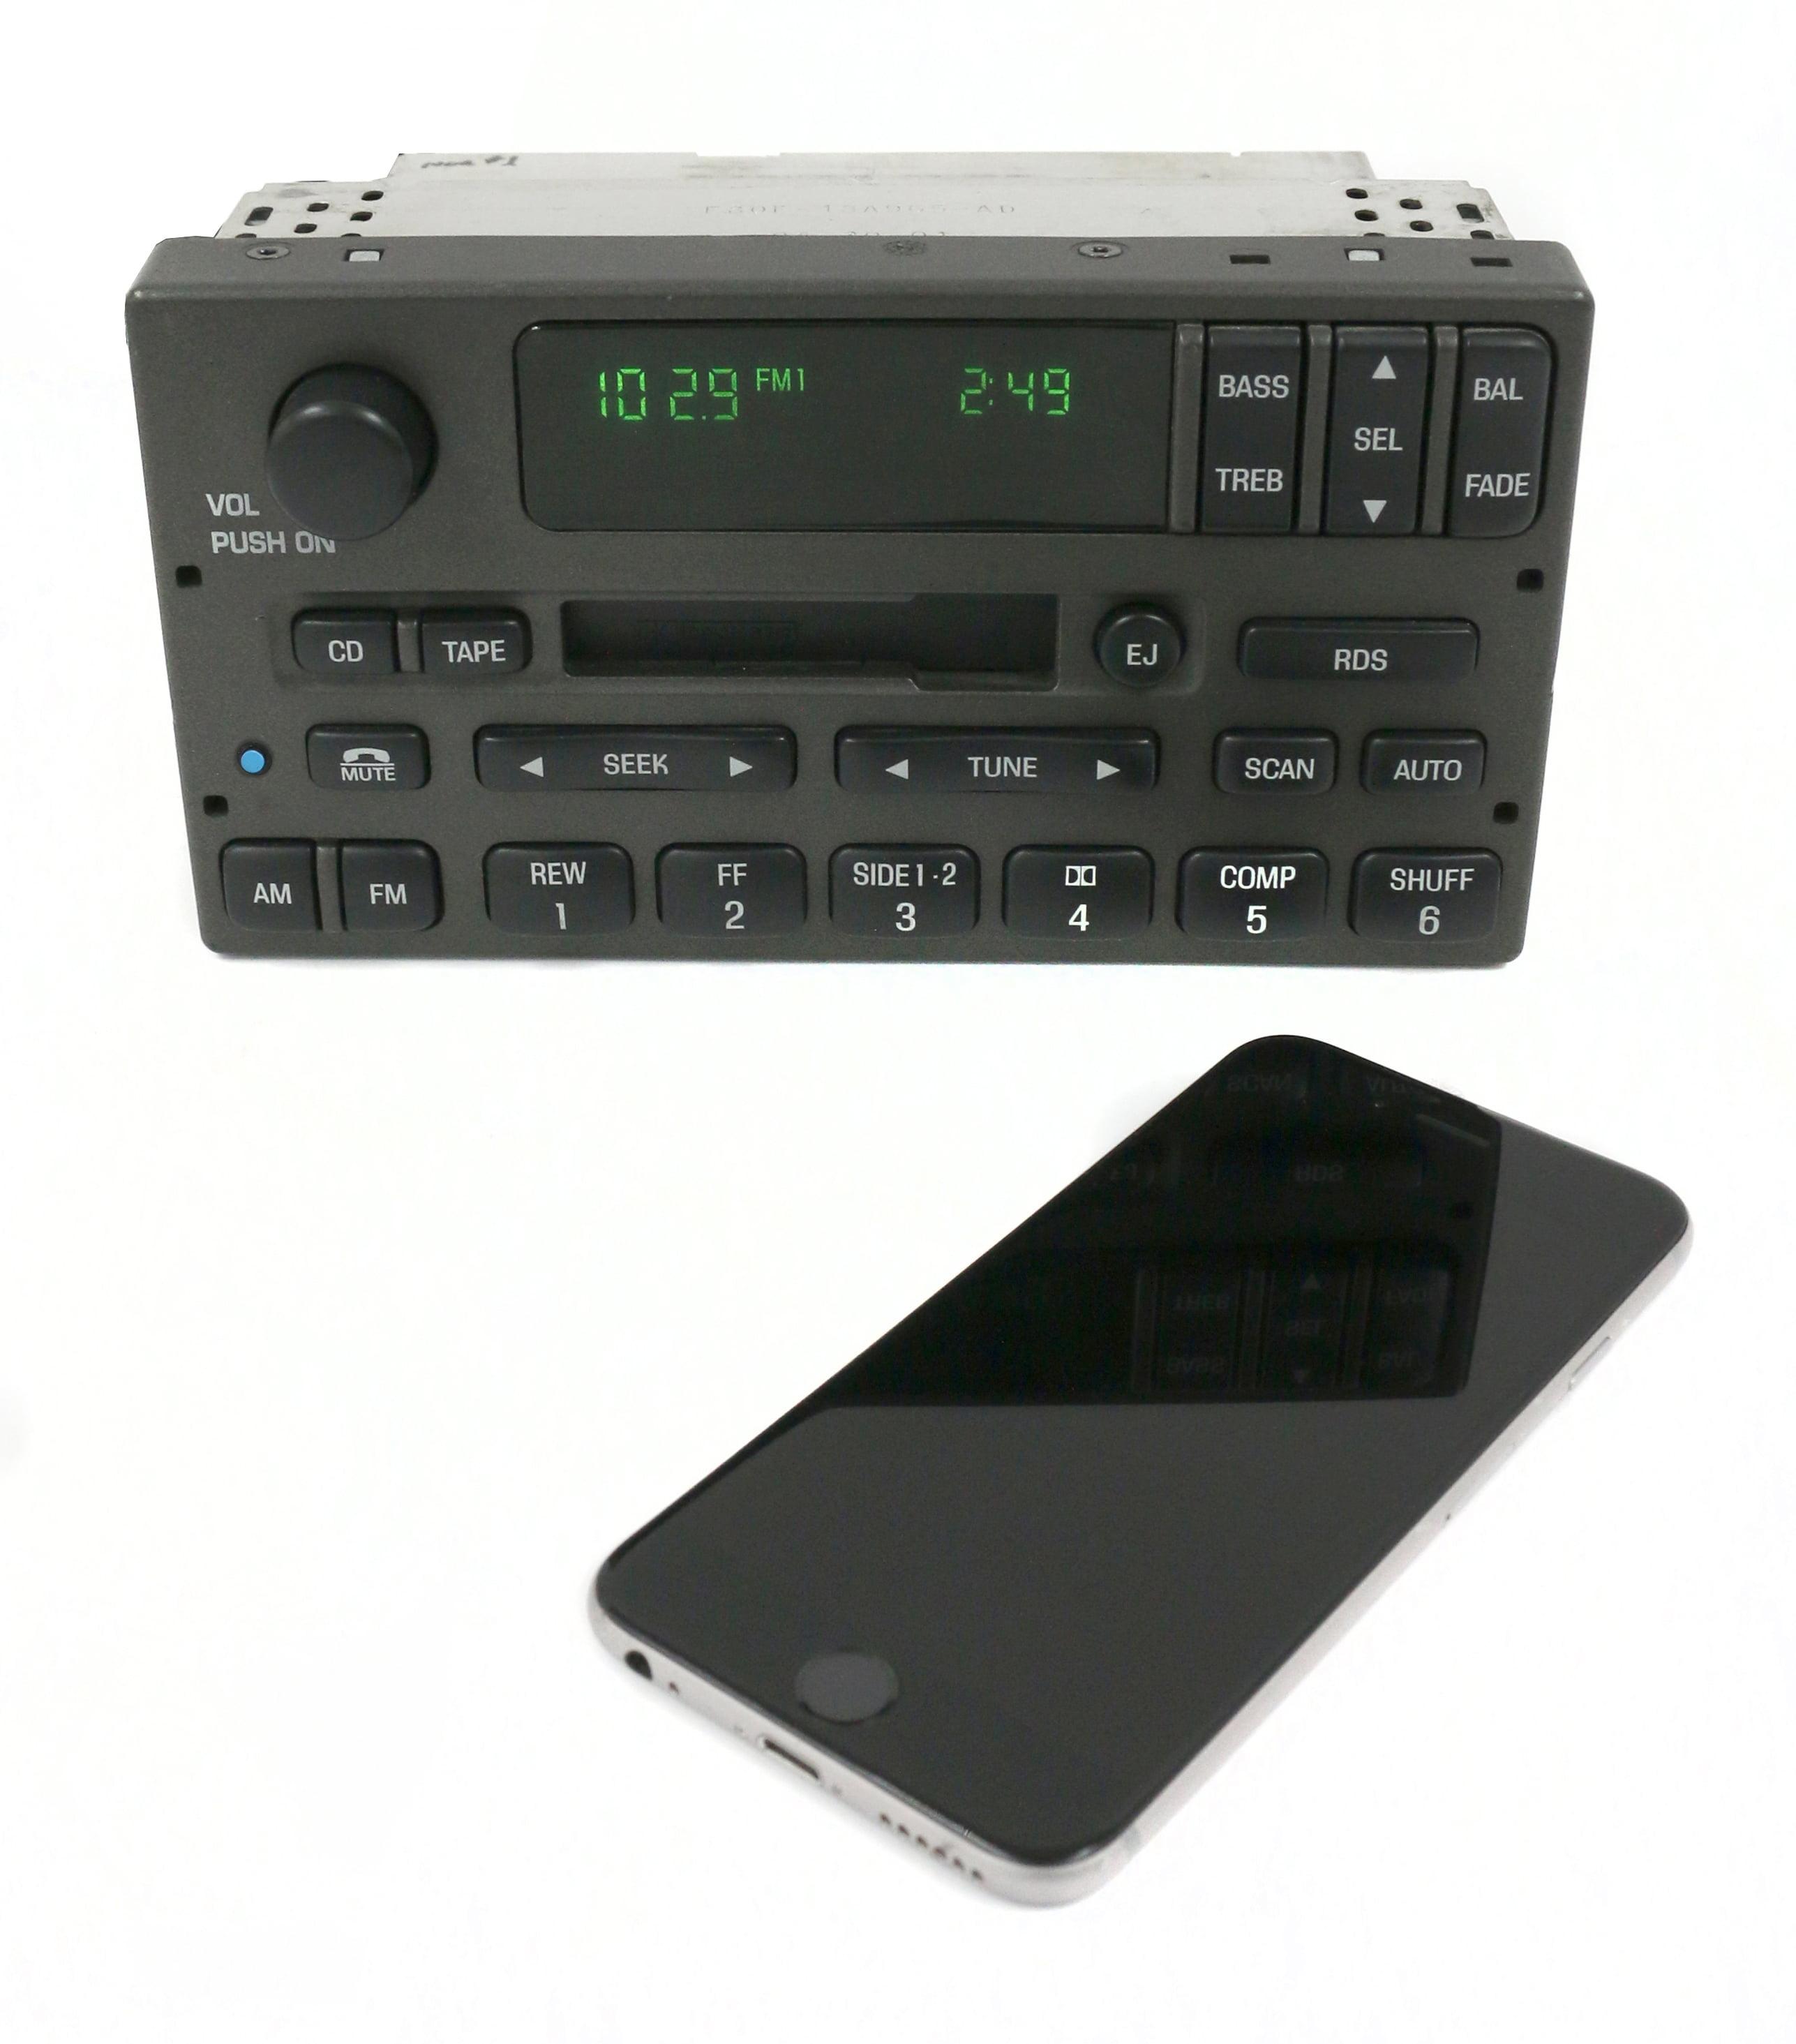 2001-02 Lincoln Town Car Radio Bluetooth AM FM Cassette Player 1W1F-18C870-DB Refurbished by Lincoln